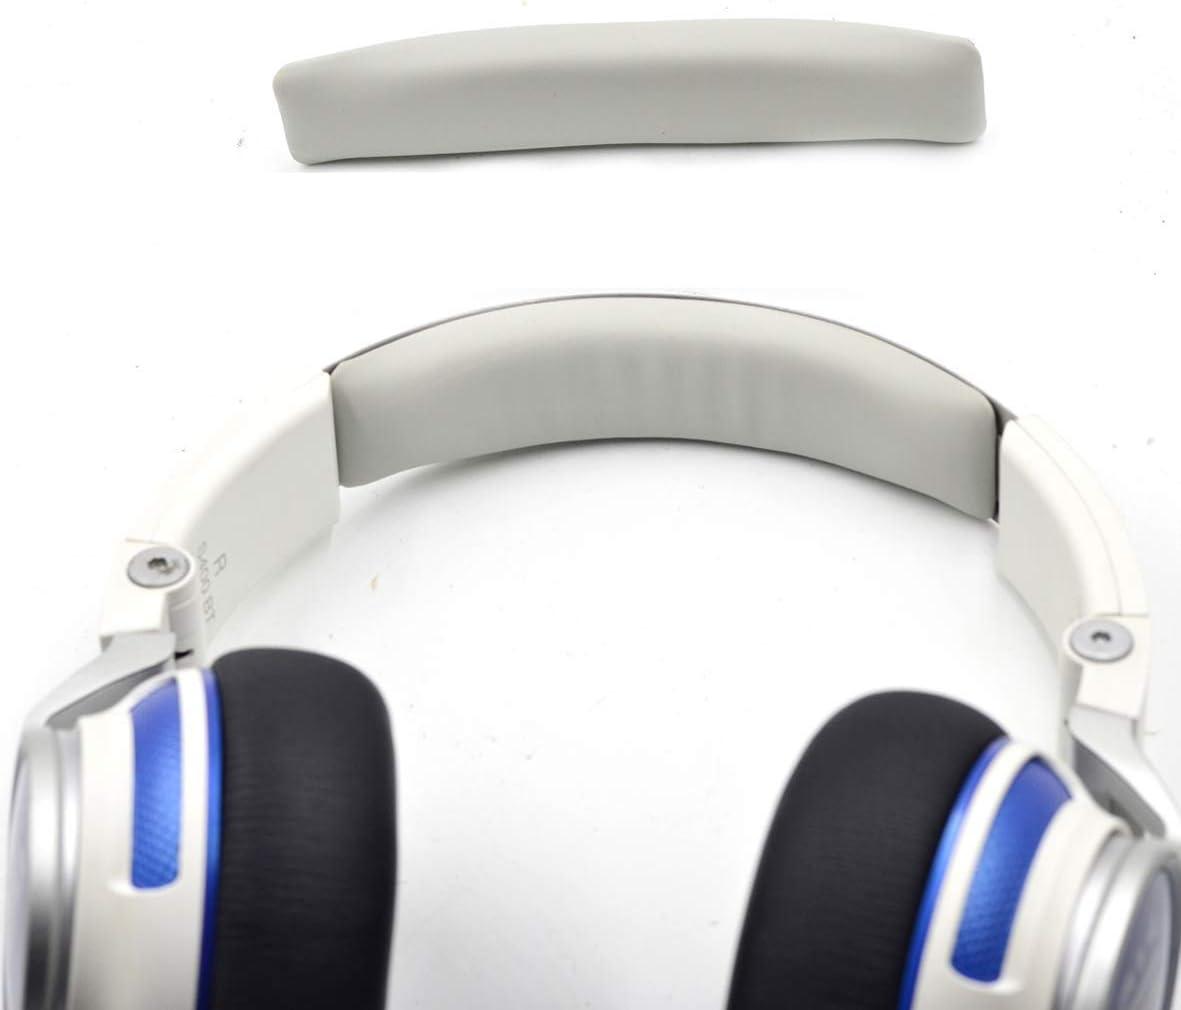 VEVER Replacement Ear Pads Cushions Headband Repair Parts Set for JBL Synchros 400BT S400 E40BT E40 BT Bluetooth Wireless On-Ear Headphones Set